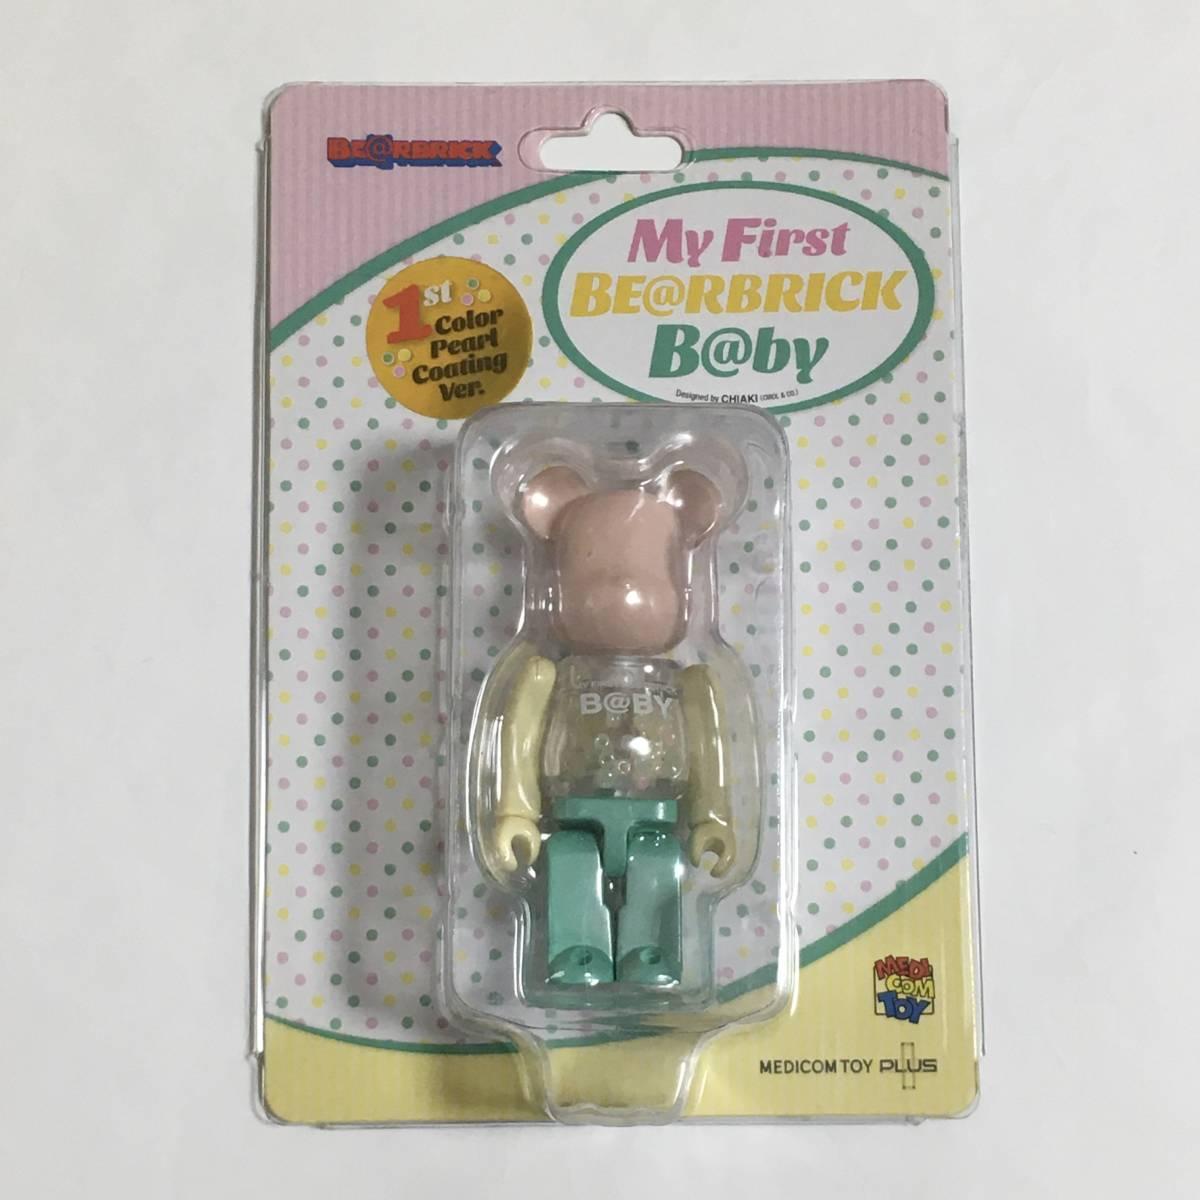 MY FIRST BE@RBRICK B@BY 1st Color Pearl Coating Ver. 100% 千秋 ベアブリック MEDICOM TOY PLUS メディコムトイ kaws 新品未開封_画像1